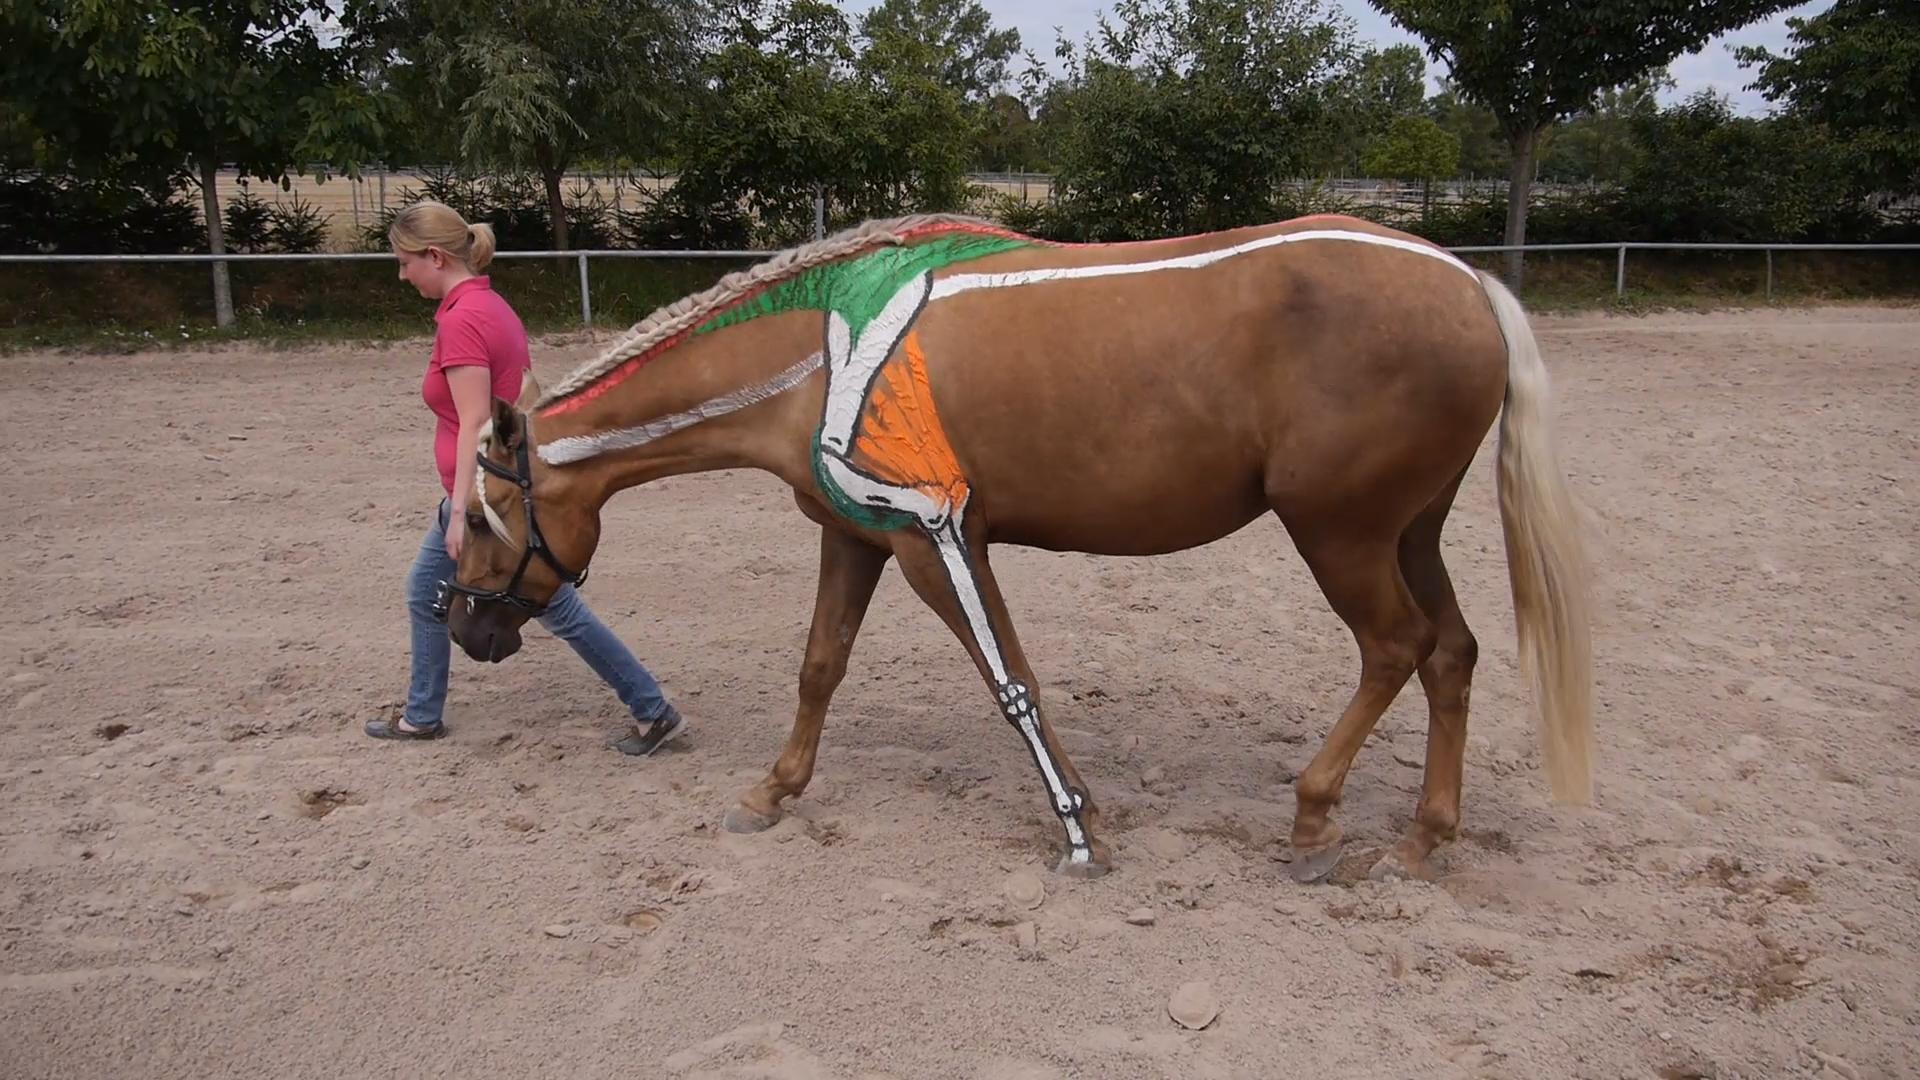 EWV Freies Lehrzentrum & Mobile Fahrpraxis für Pferde